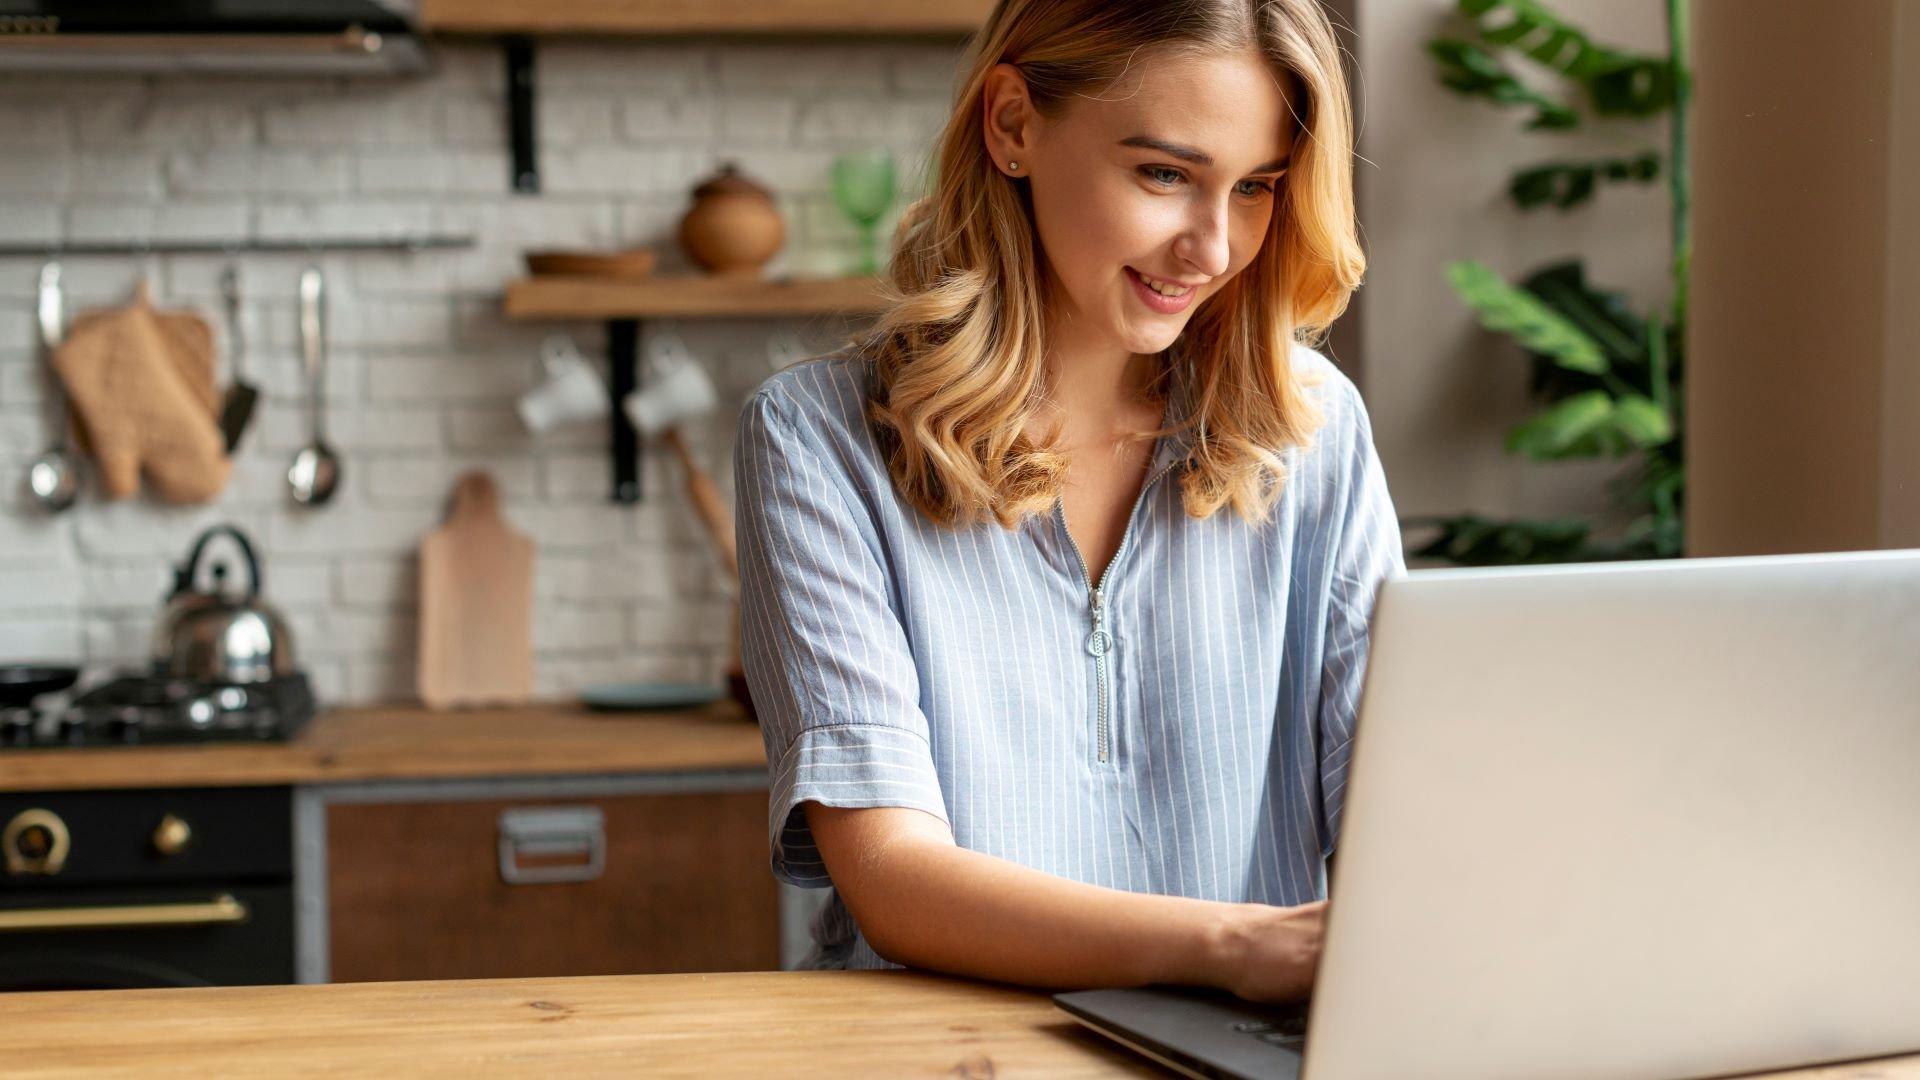 Online shopper searching Google for brand information